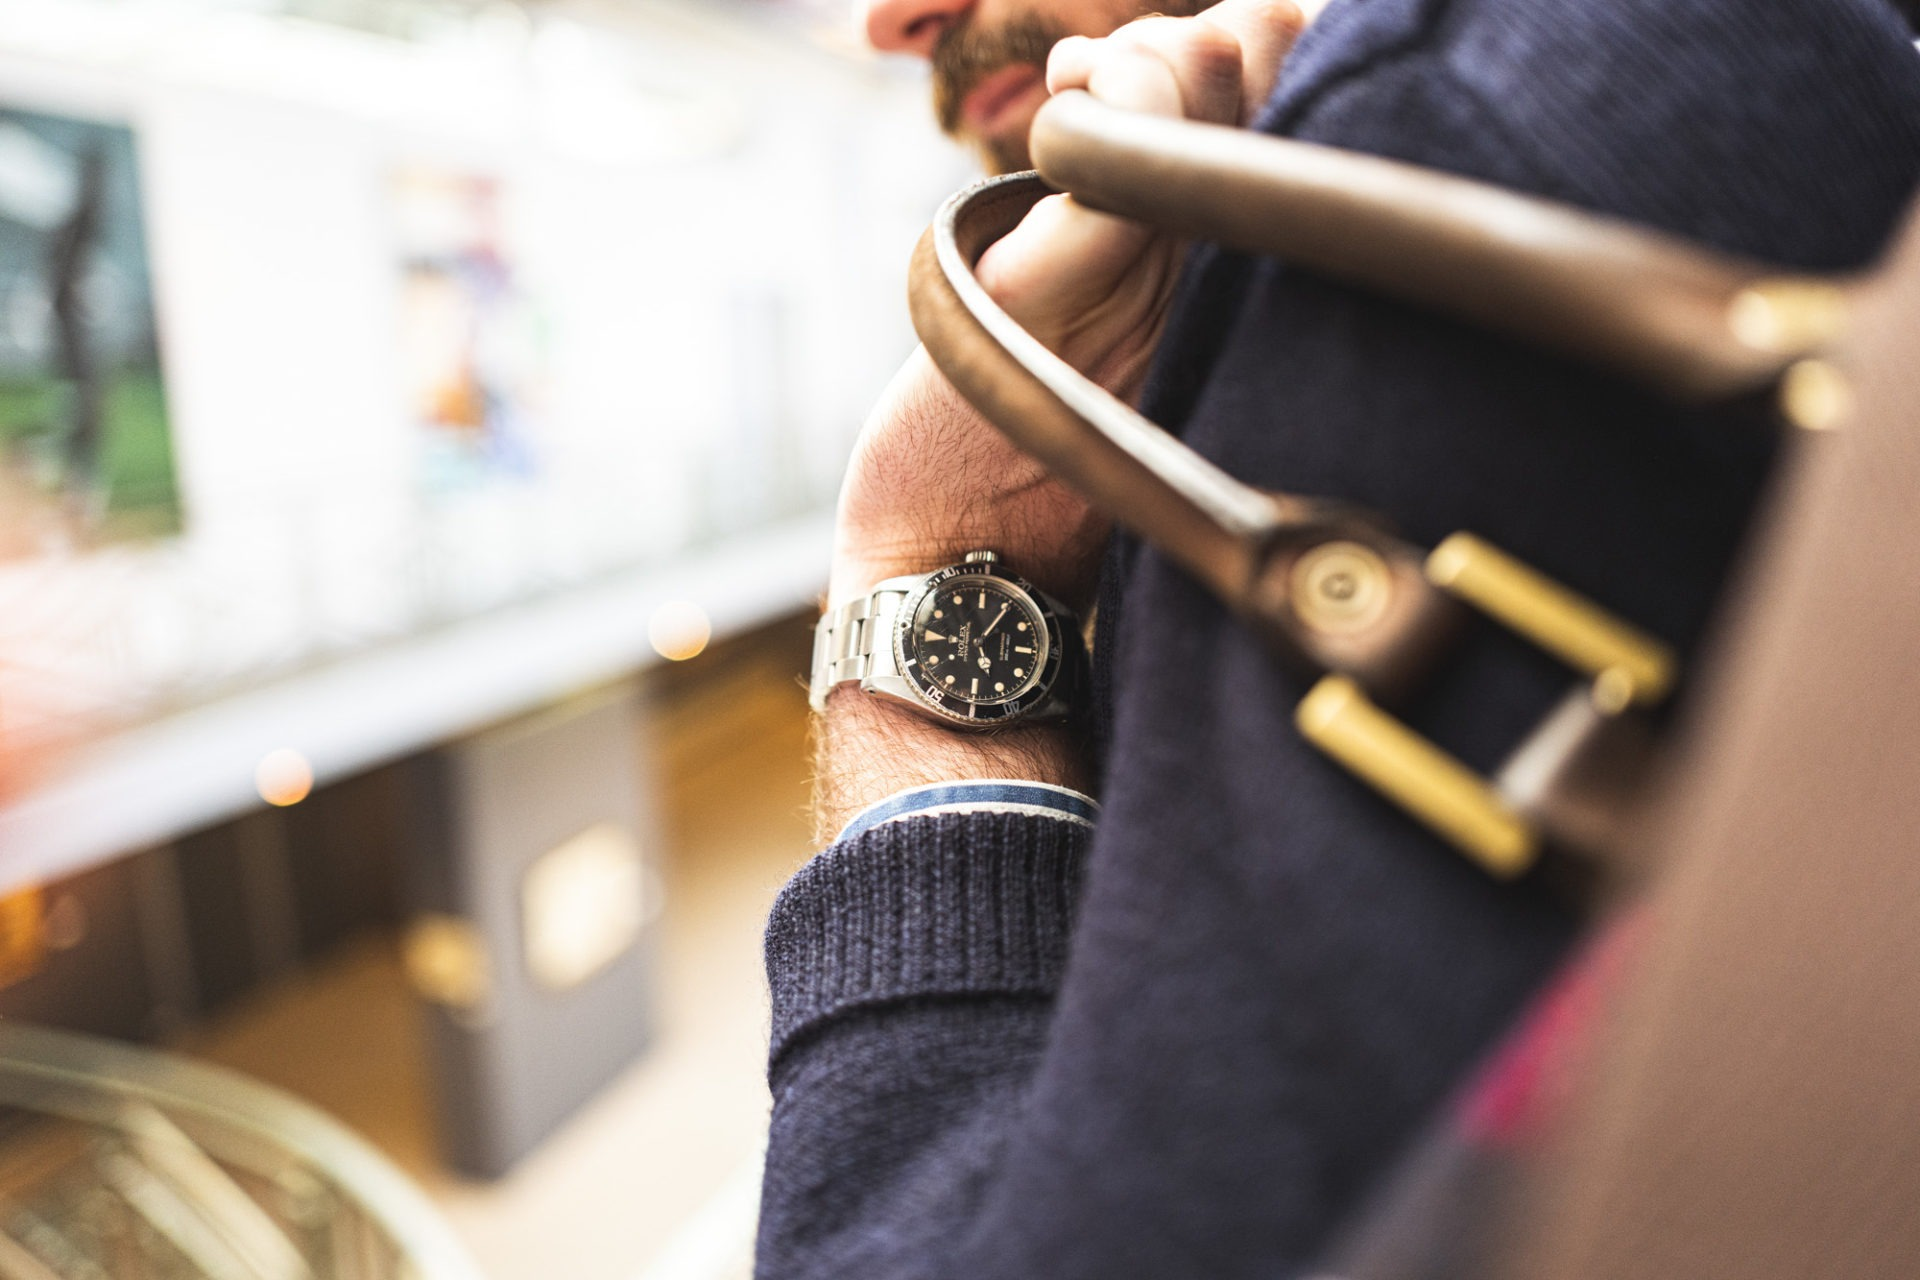 Rolex Submariner Ref. 6538 - Vente importante de montres de collection par Tajan le 2 juillet